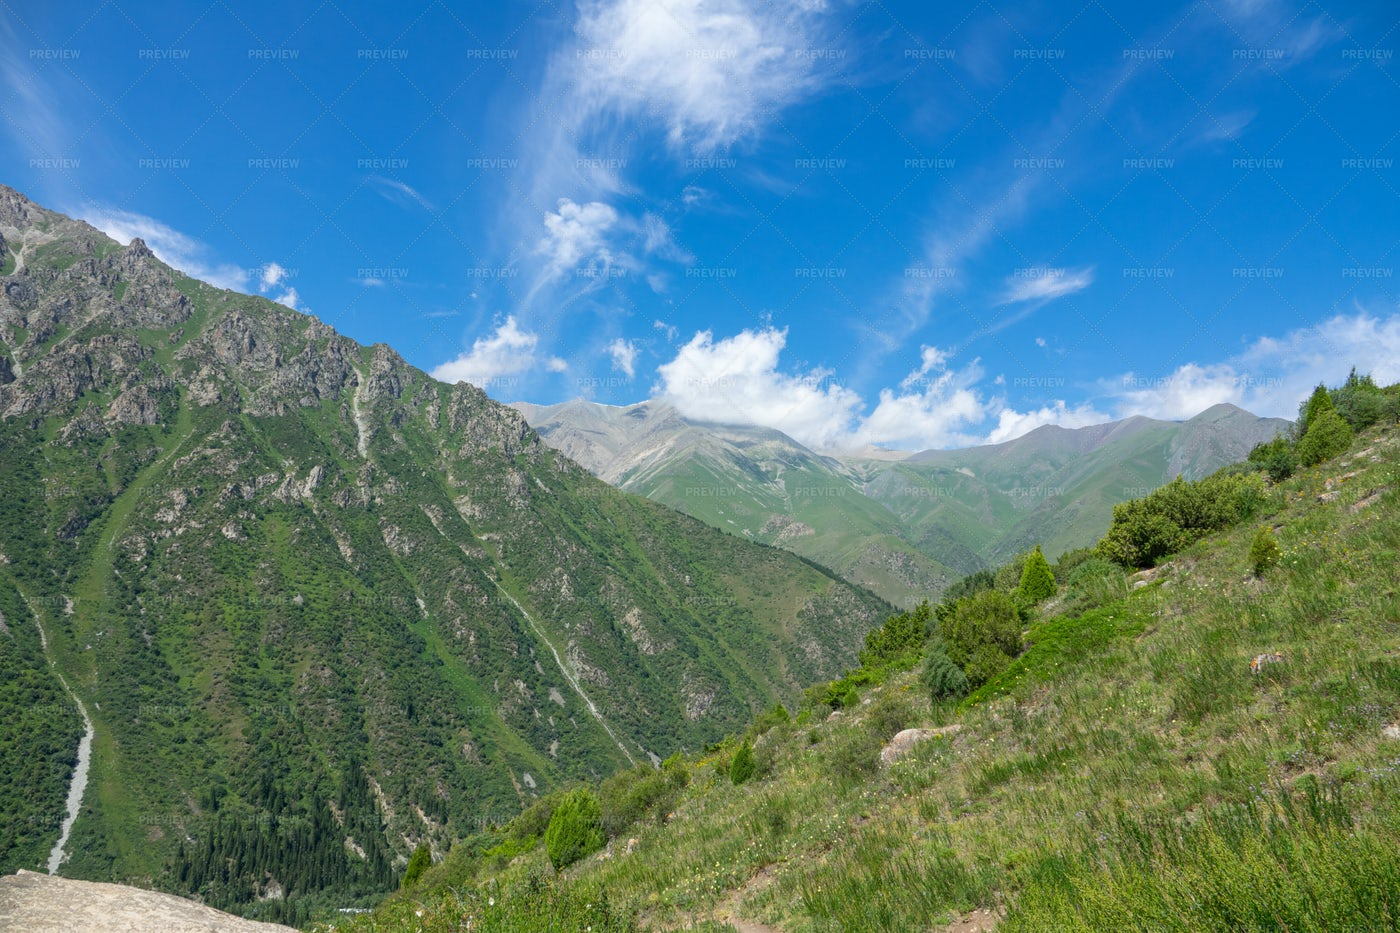 Beautiful Mountain Landscape In Summer: Stock Photos